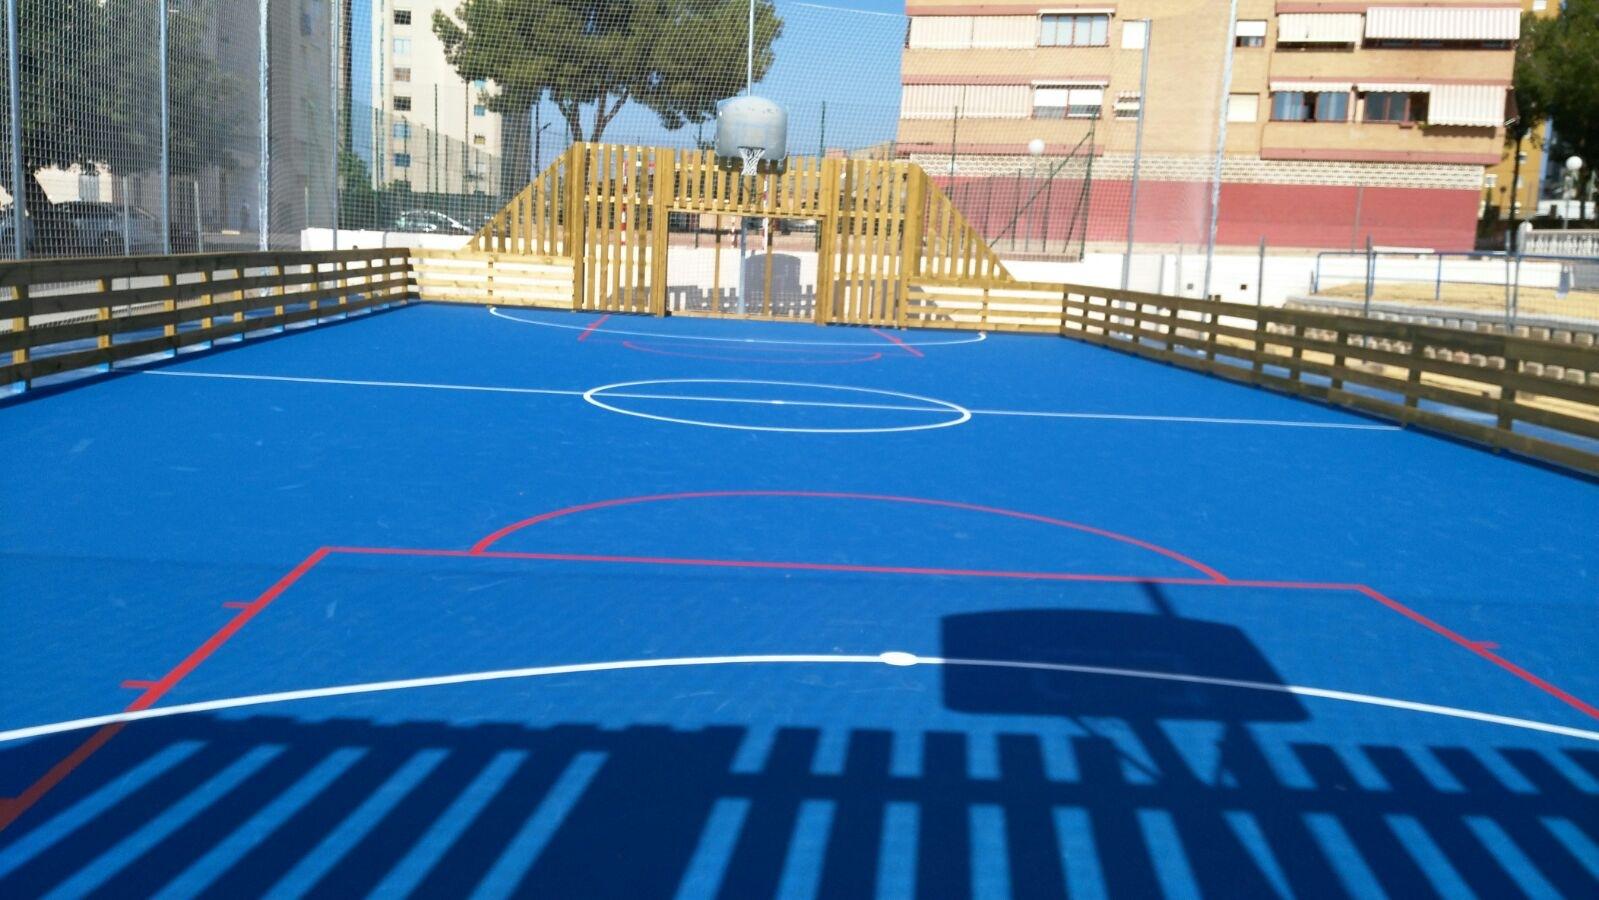 Pista Global Grass Sportplus para área multideportes en Benidorm (Alicante)